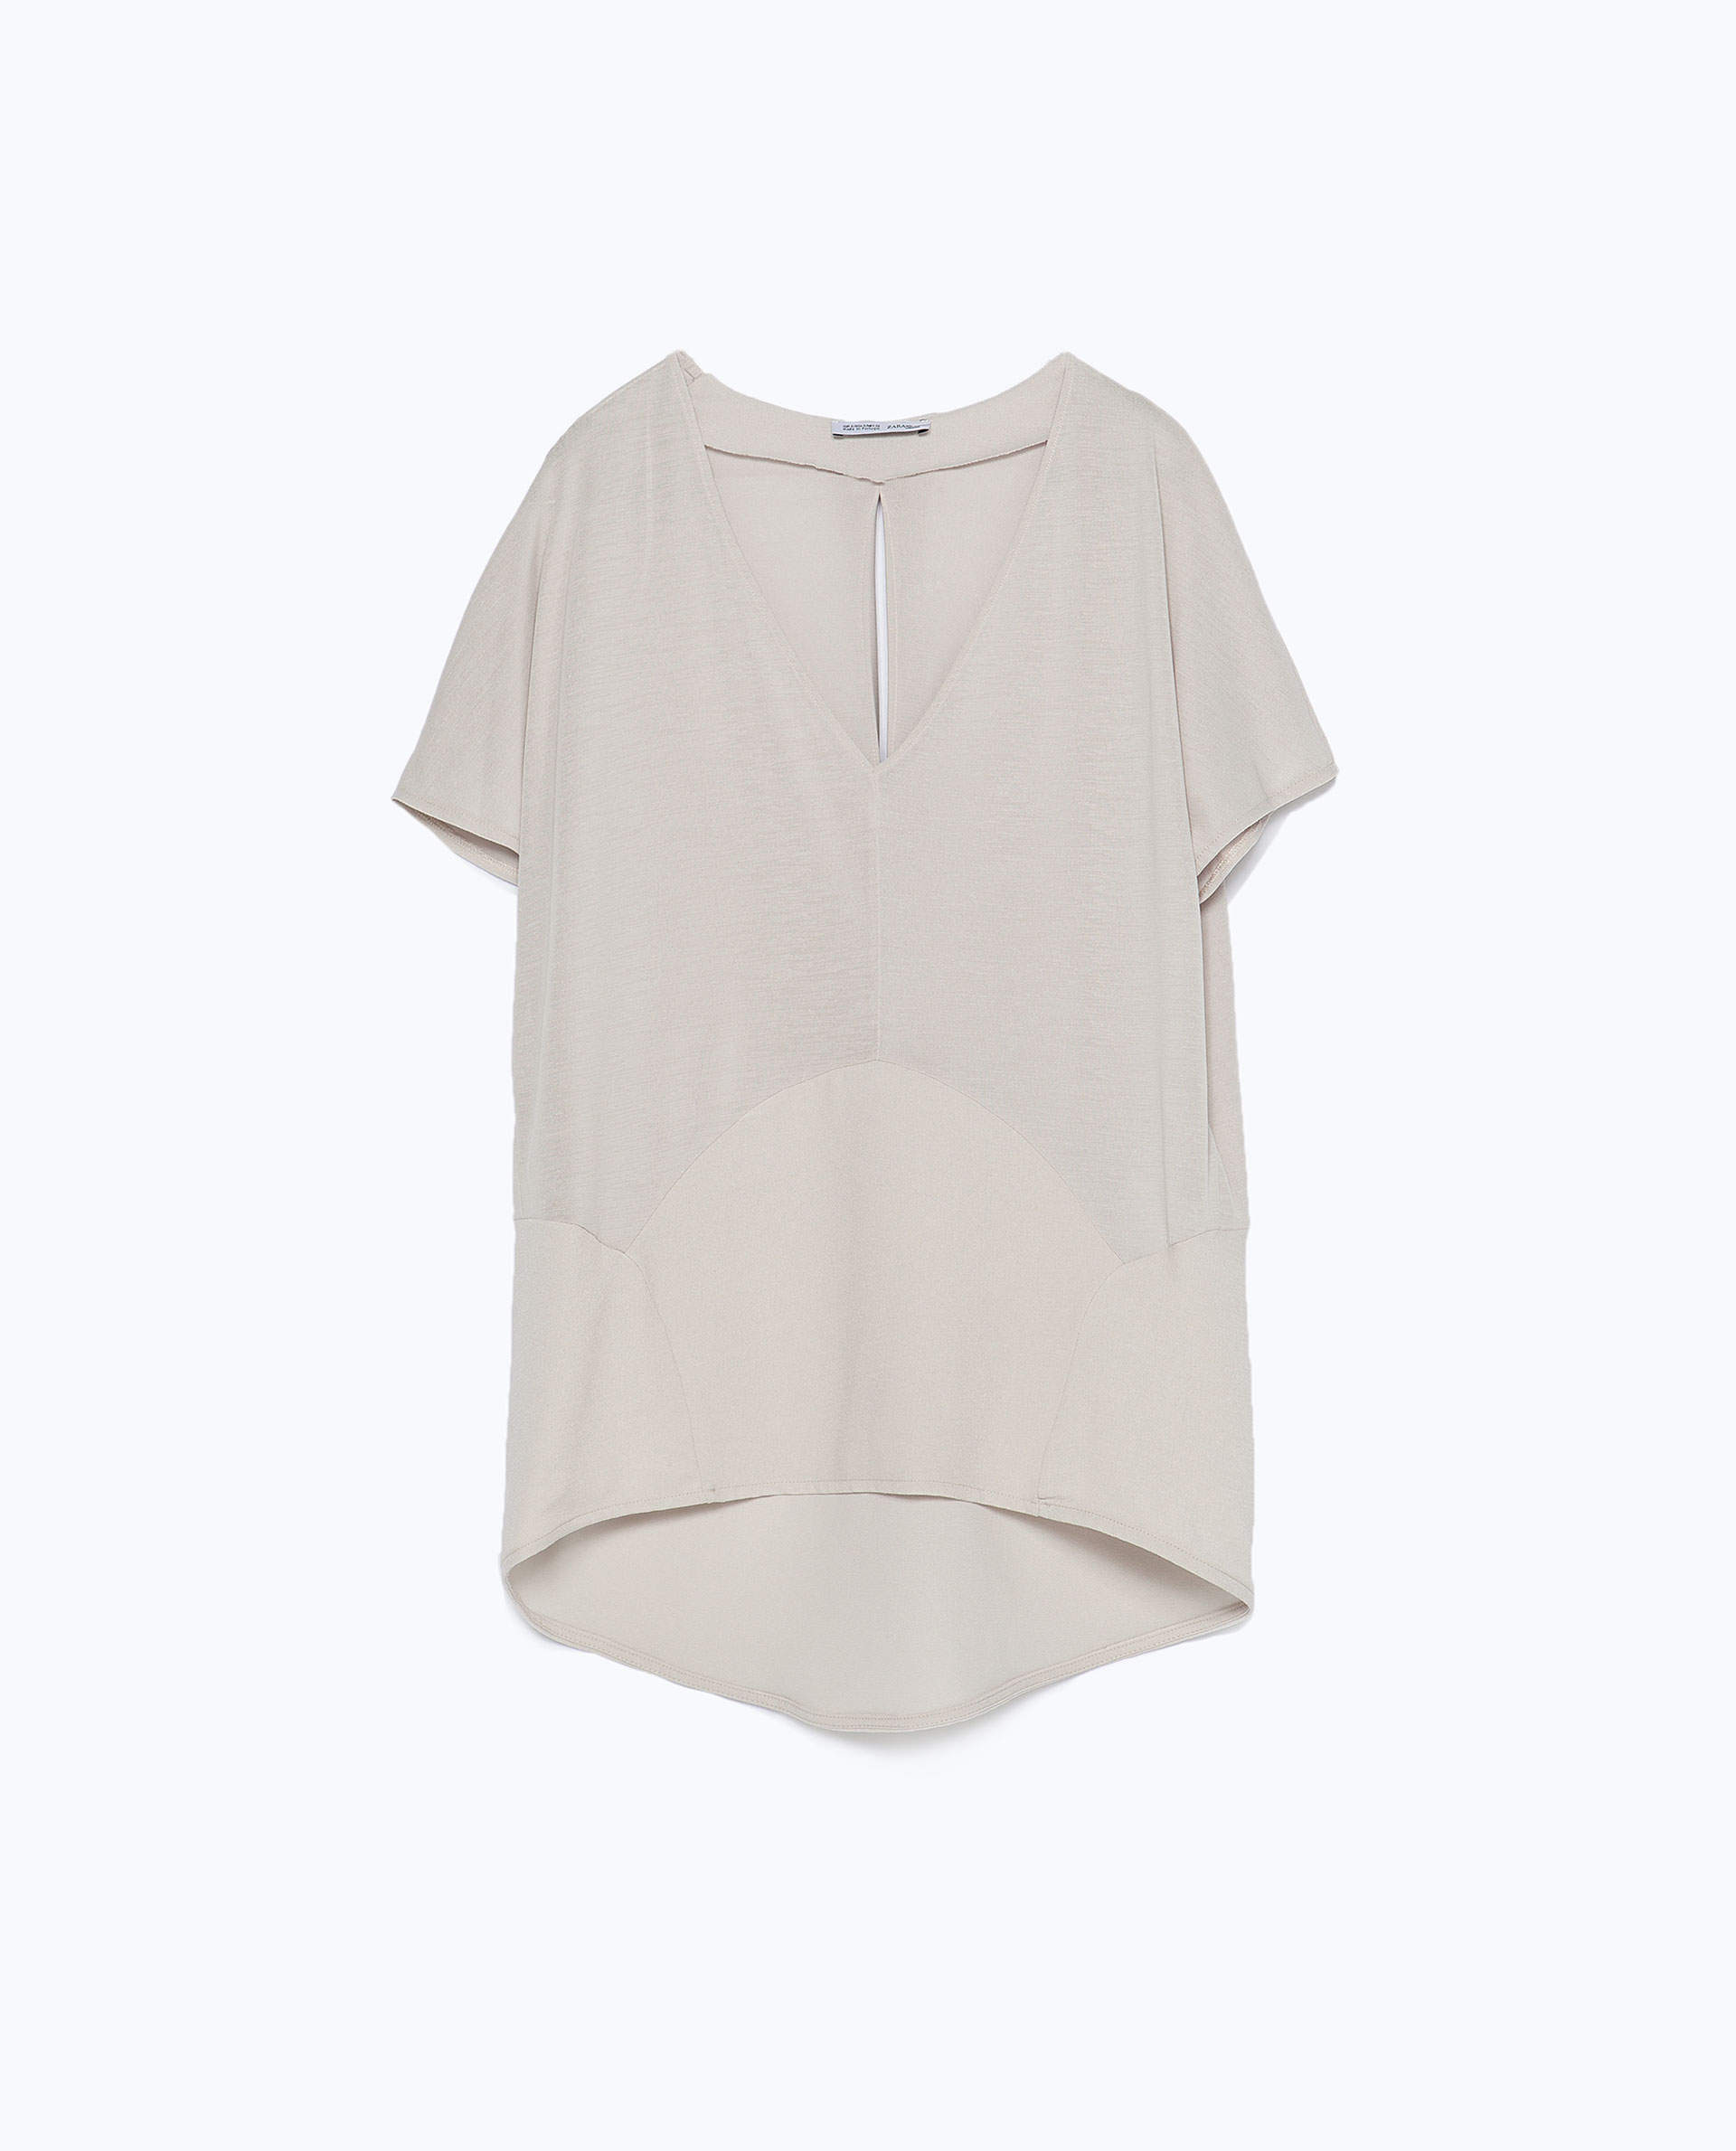 Zara Shirt Style Blouse 10